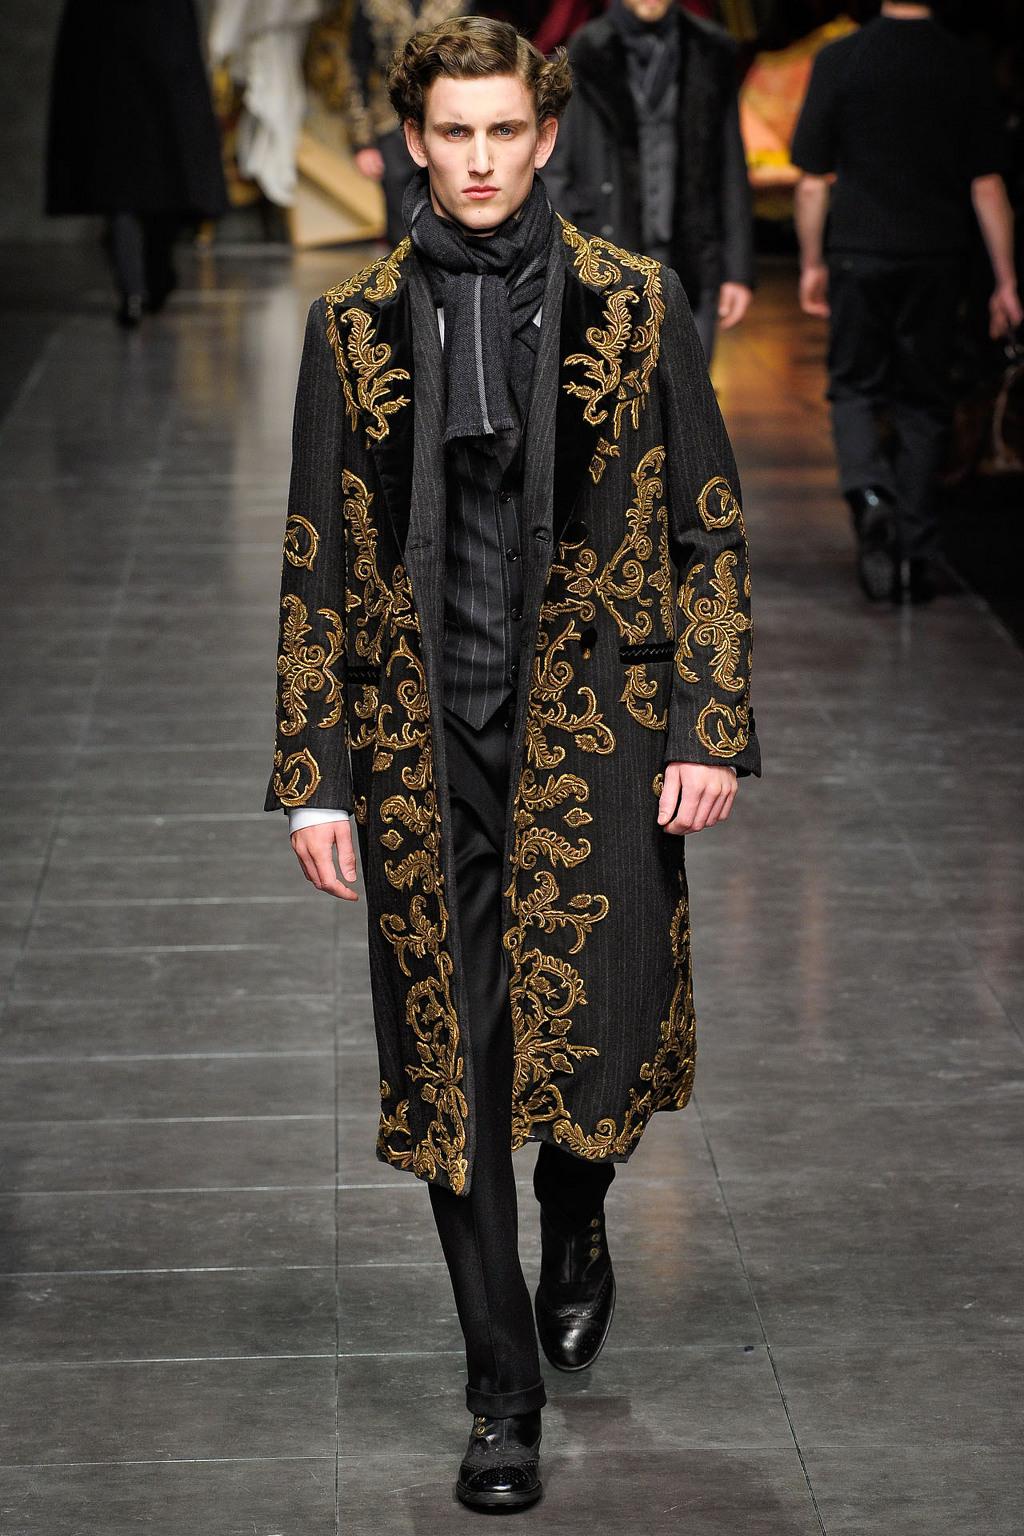 Star Homme Fashion